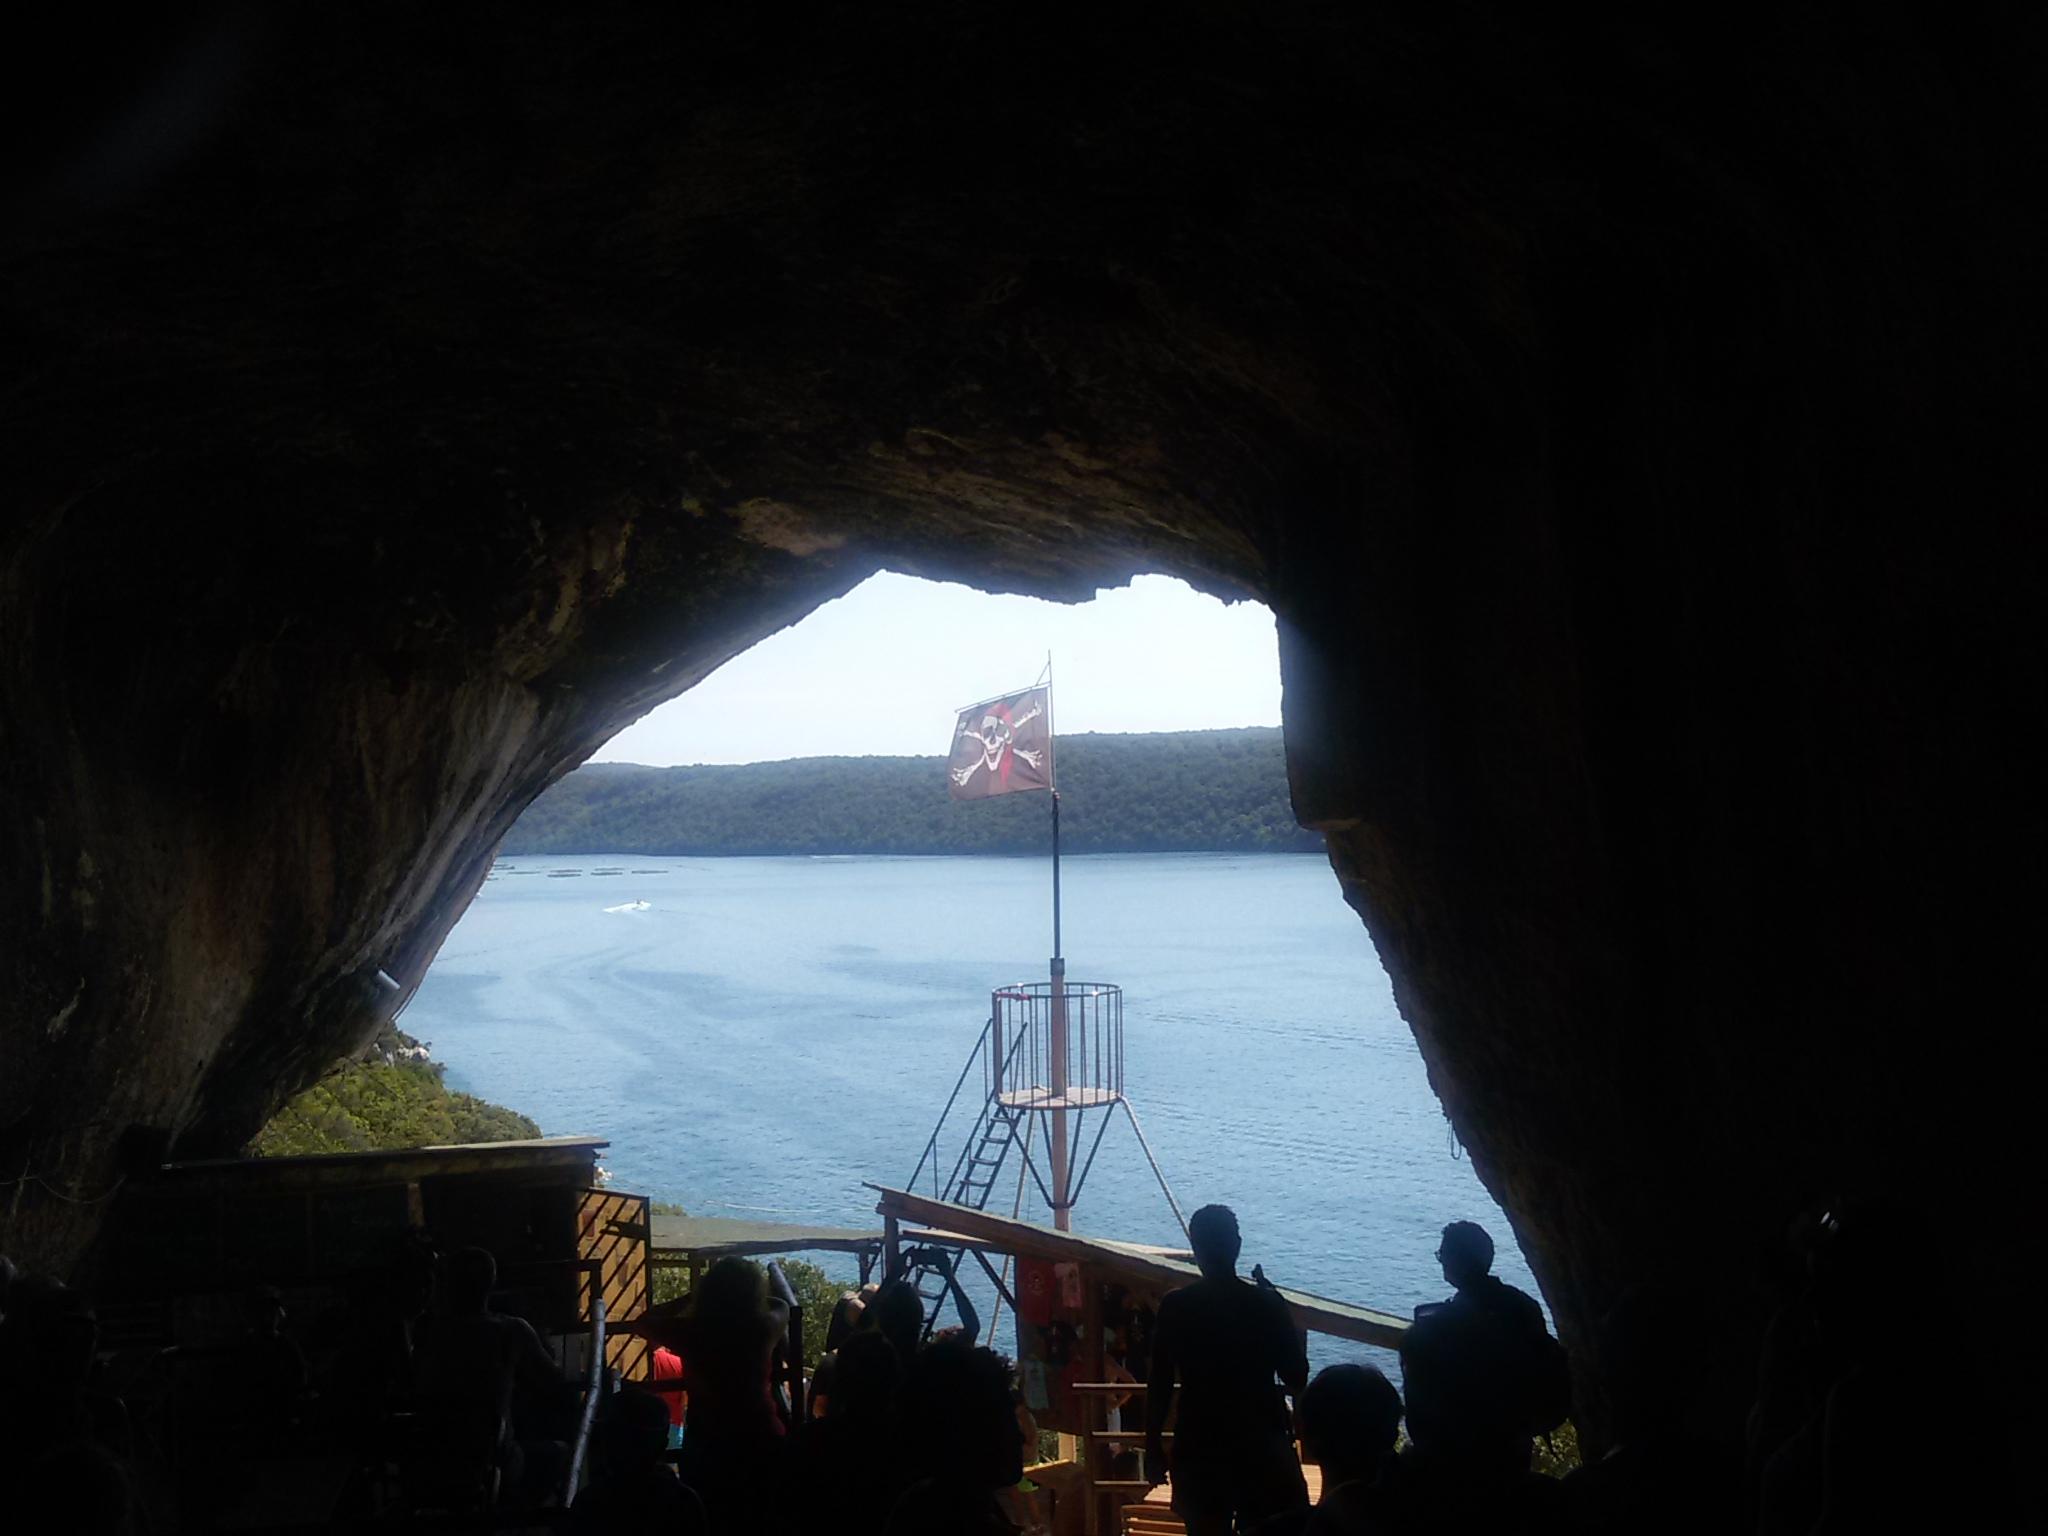 Grotta dei pirati